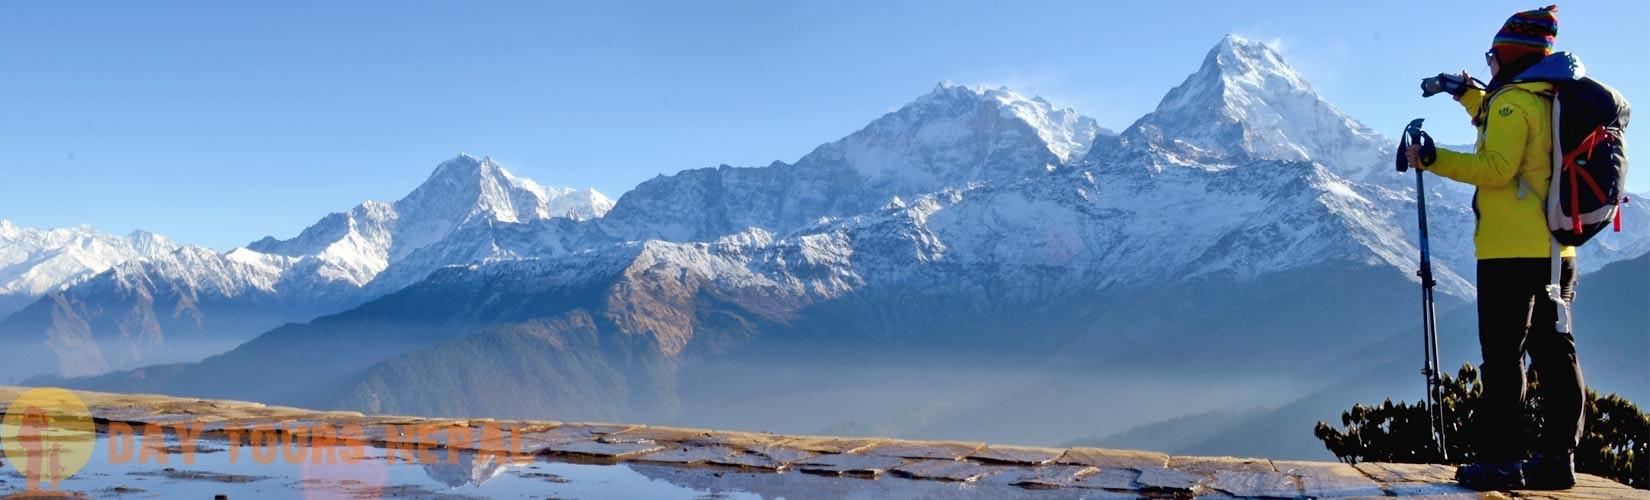 Taste of Nepal Tour Ghorepani Trekking